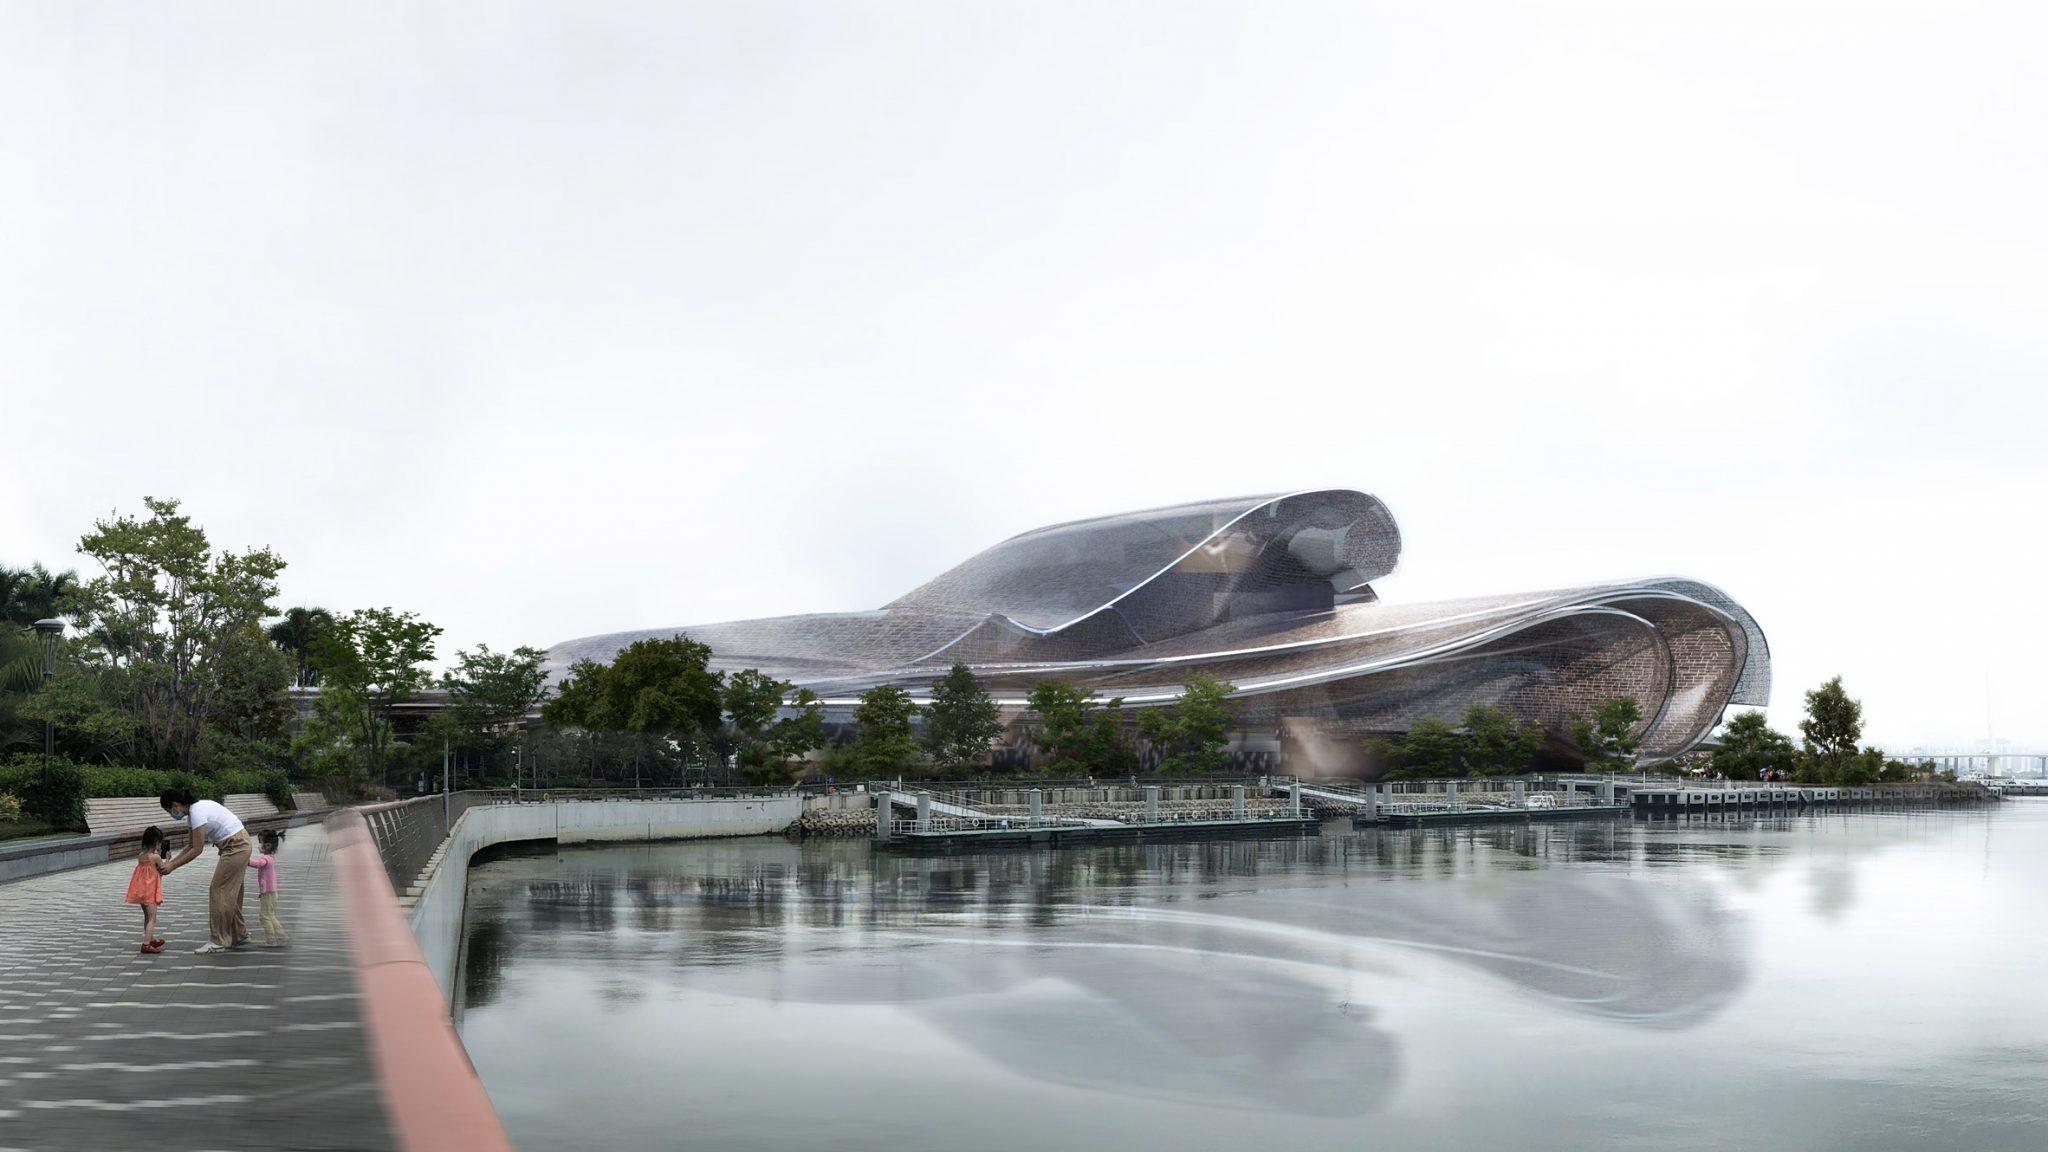 shenzhen-opera-house-jean-nouvel-china-architecture_dezeen_2364_hero-2048x1152